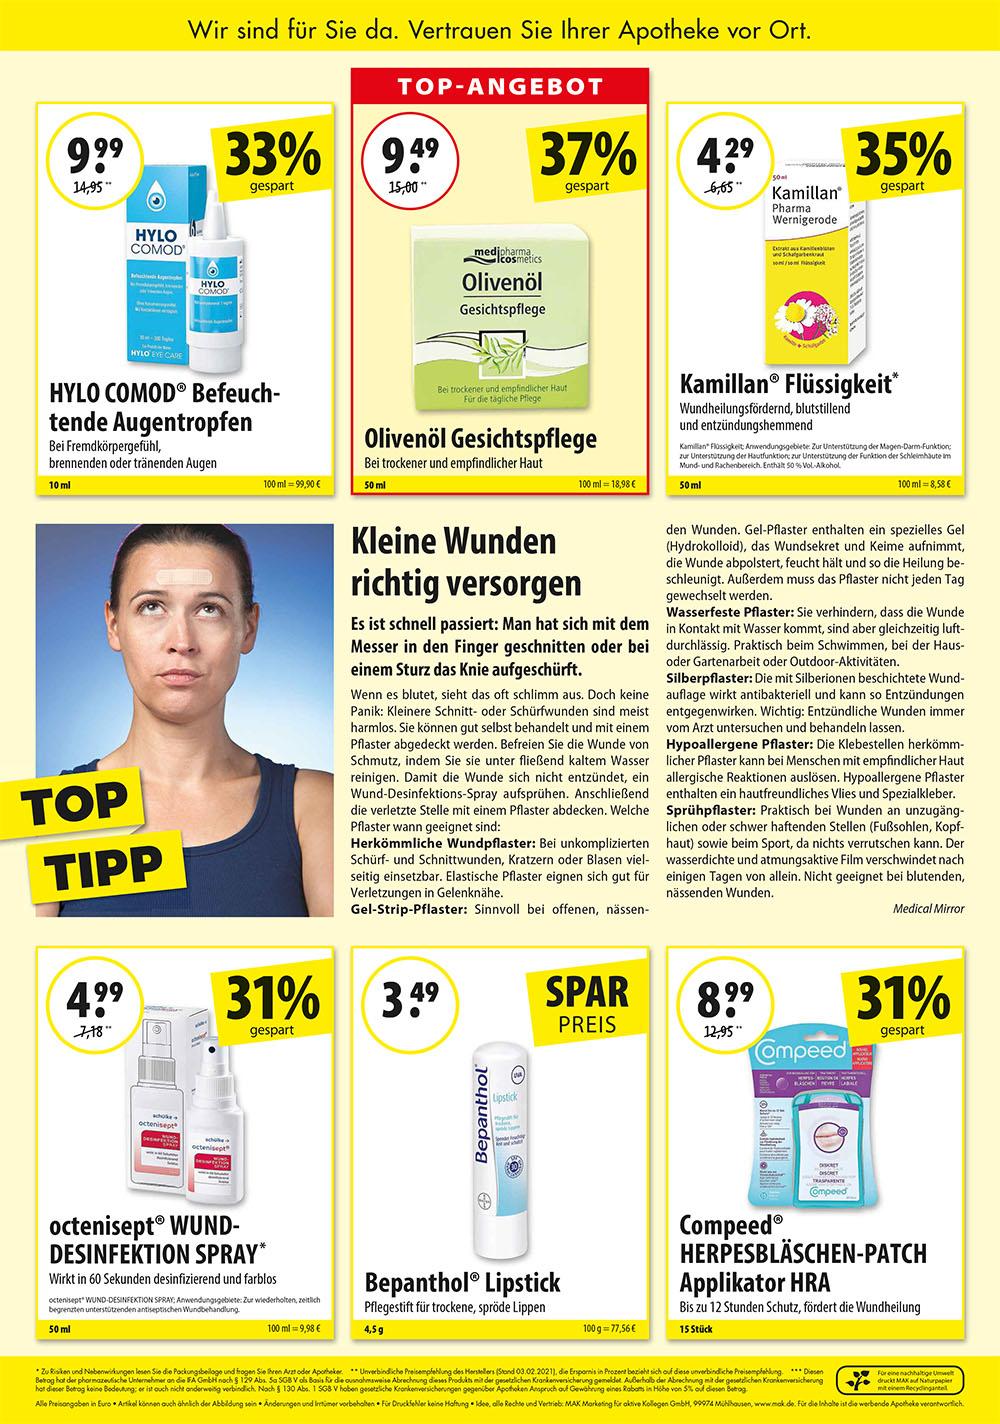 http://www.apotheken.de/fileadmin/clubarea/00000-Angebote/22459_gruen_angebot_2.jpg